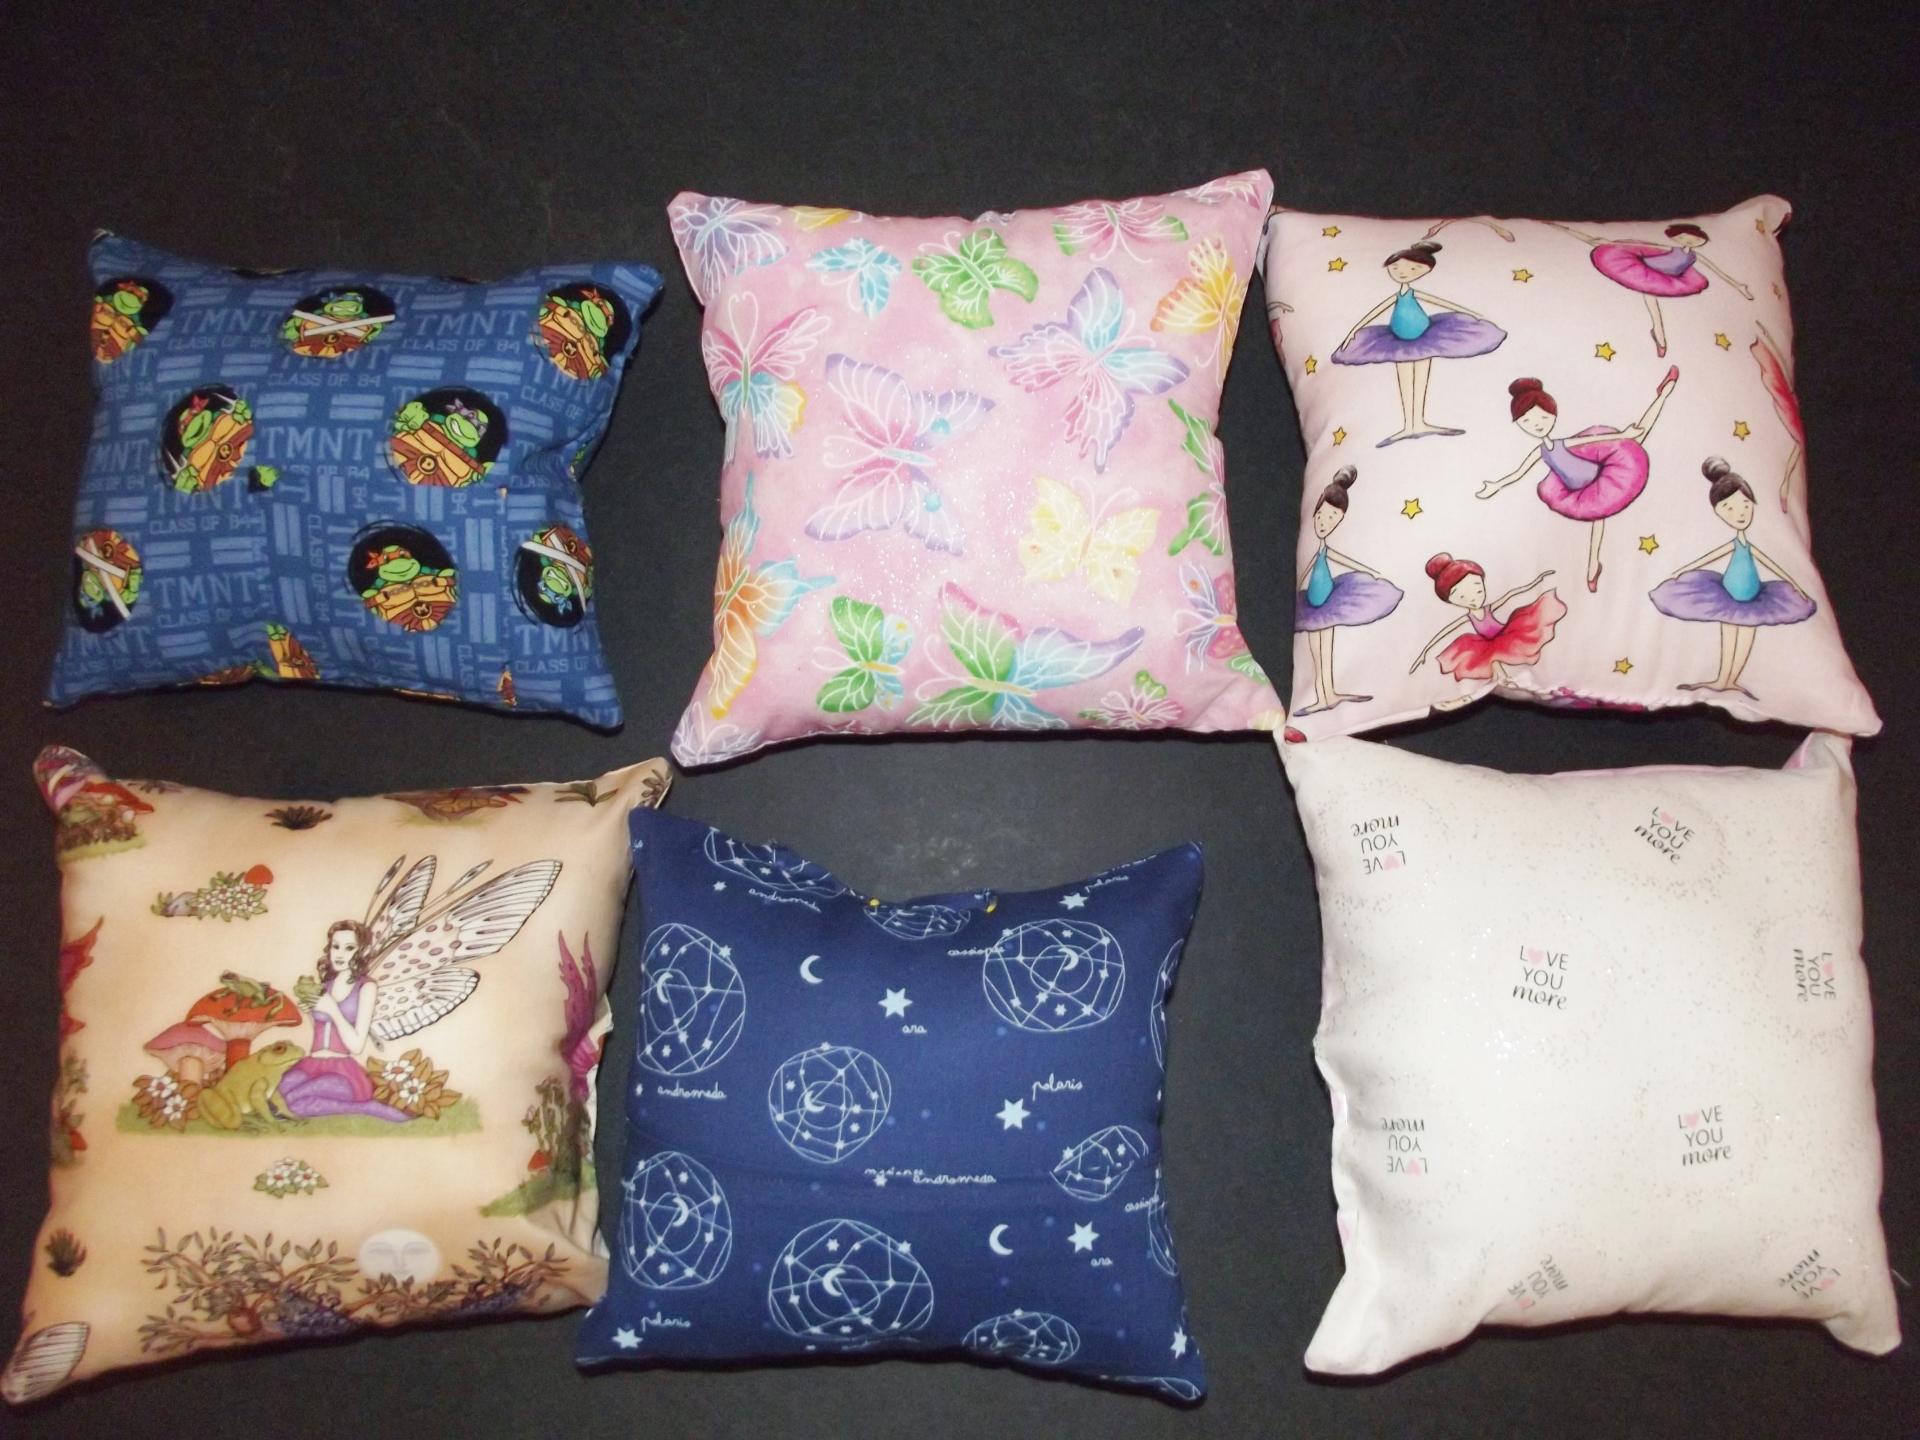 Treasure Pillows